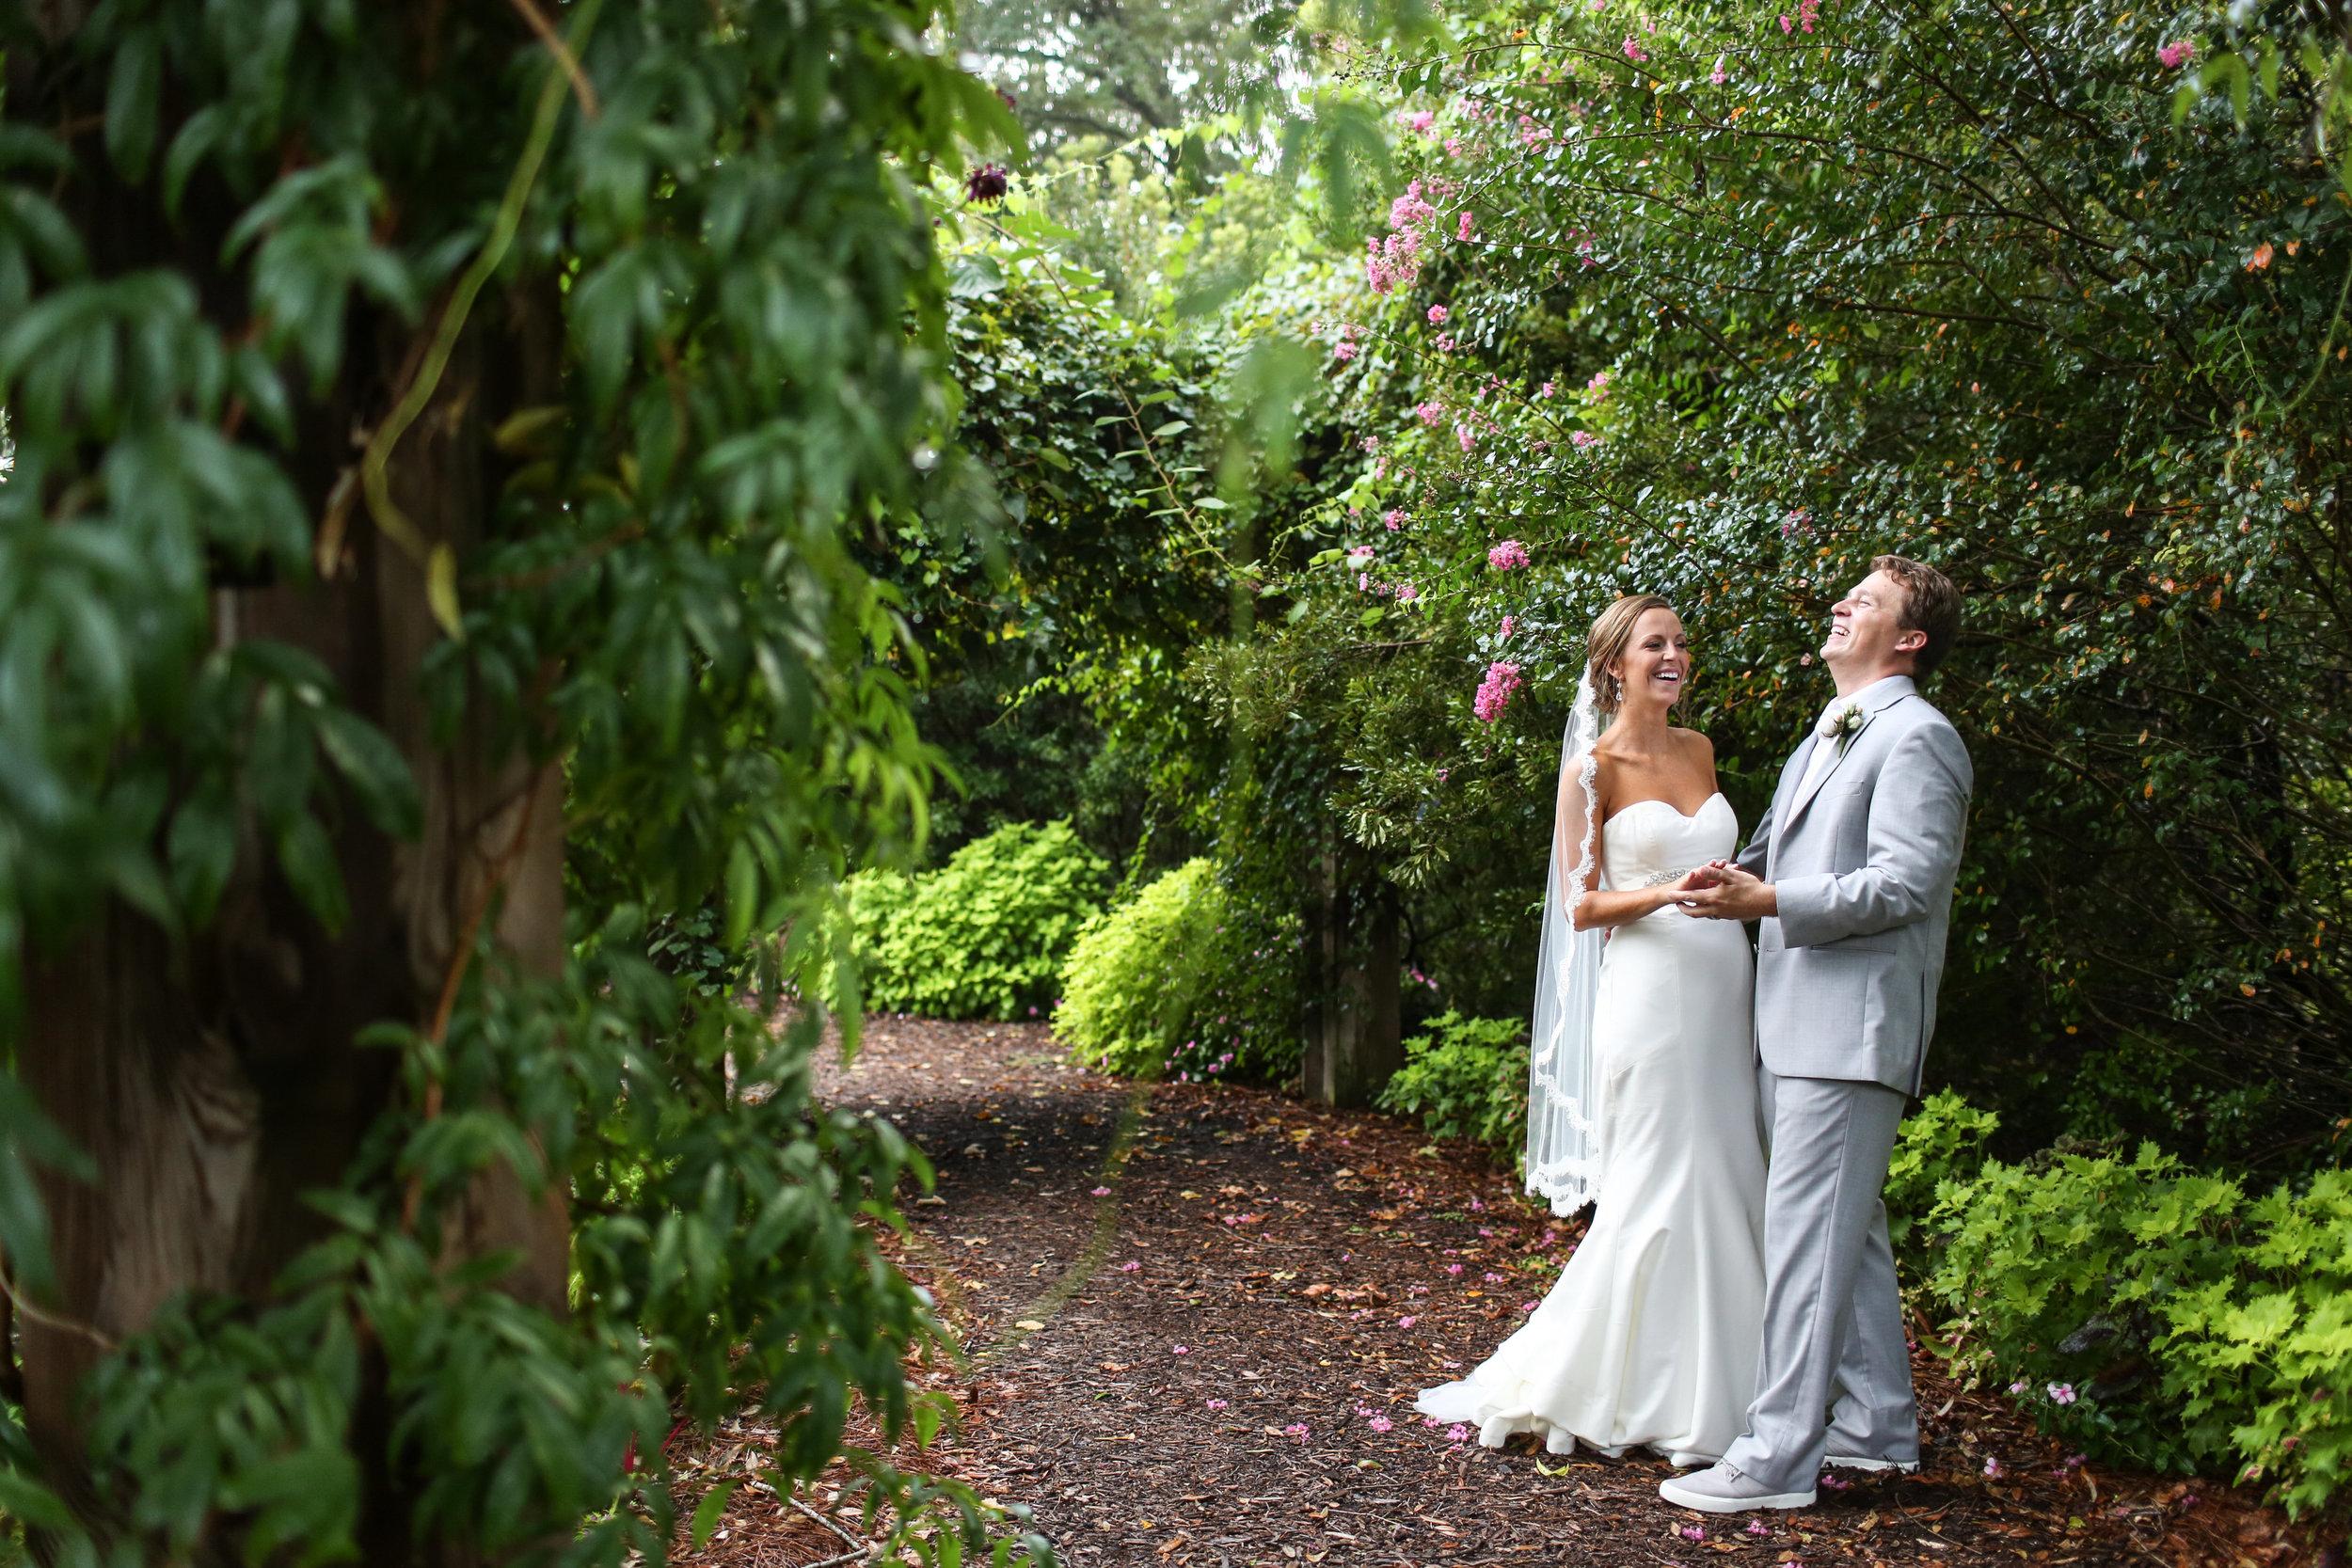 finnegan-photography-ivory-and-beau-bridal-boutique-nicole-miller-dakota-jaclyn-jordan-anne-veil-savannah-bridal-boutique-savannah-wedding-dresses-savannah-weddings-statesboro-wedding-barn-wedding-savannah-bridal-georgia-bridal-boutique-19.jpg